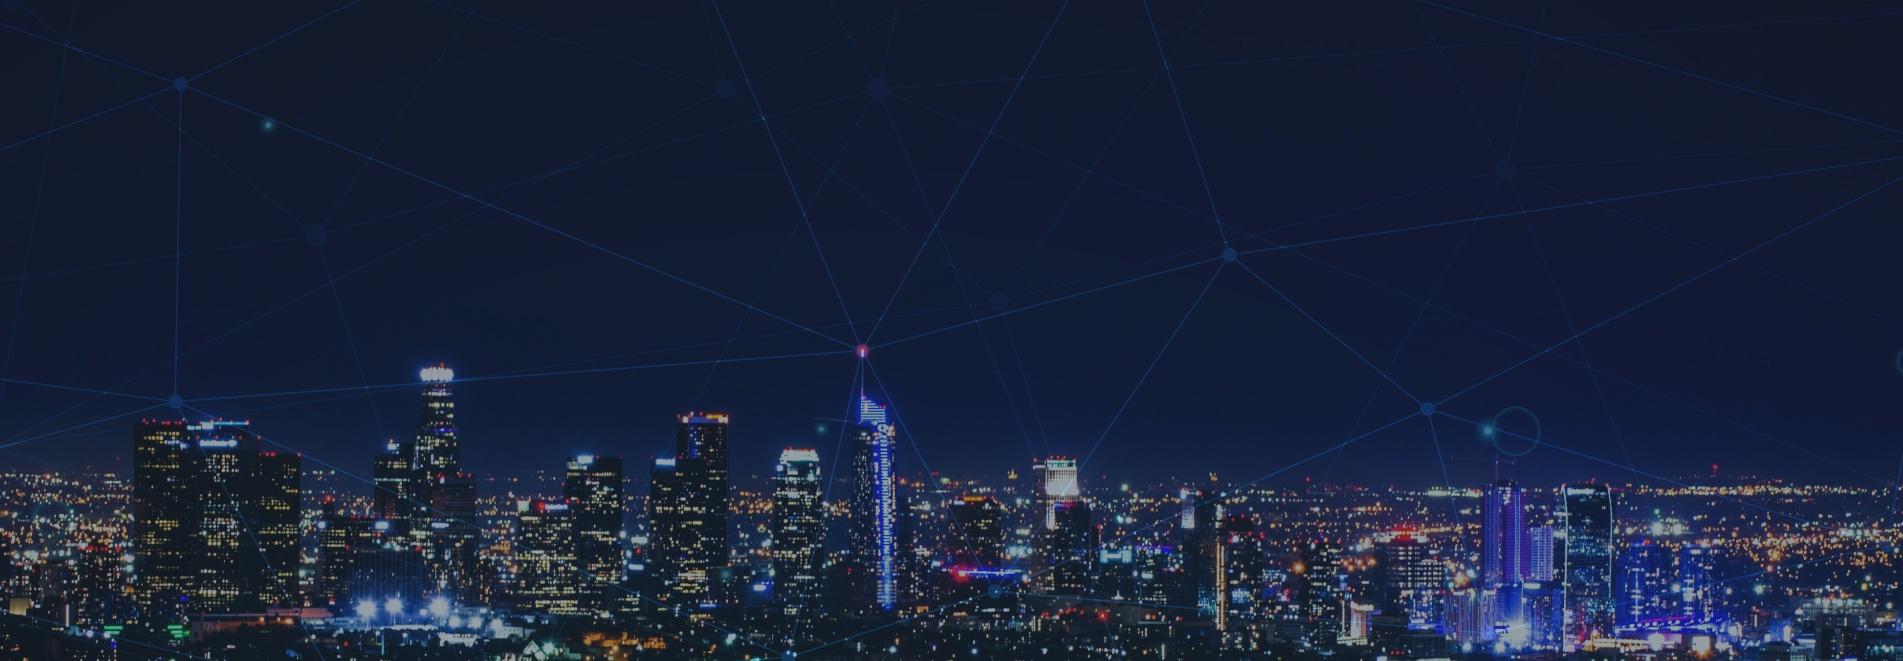 Los Angeles Cloud hosting provider